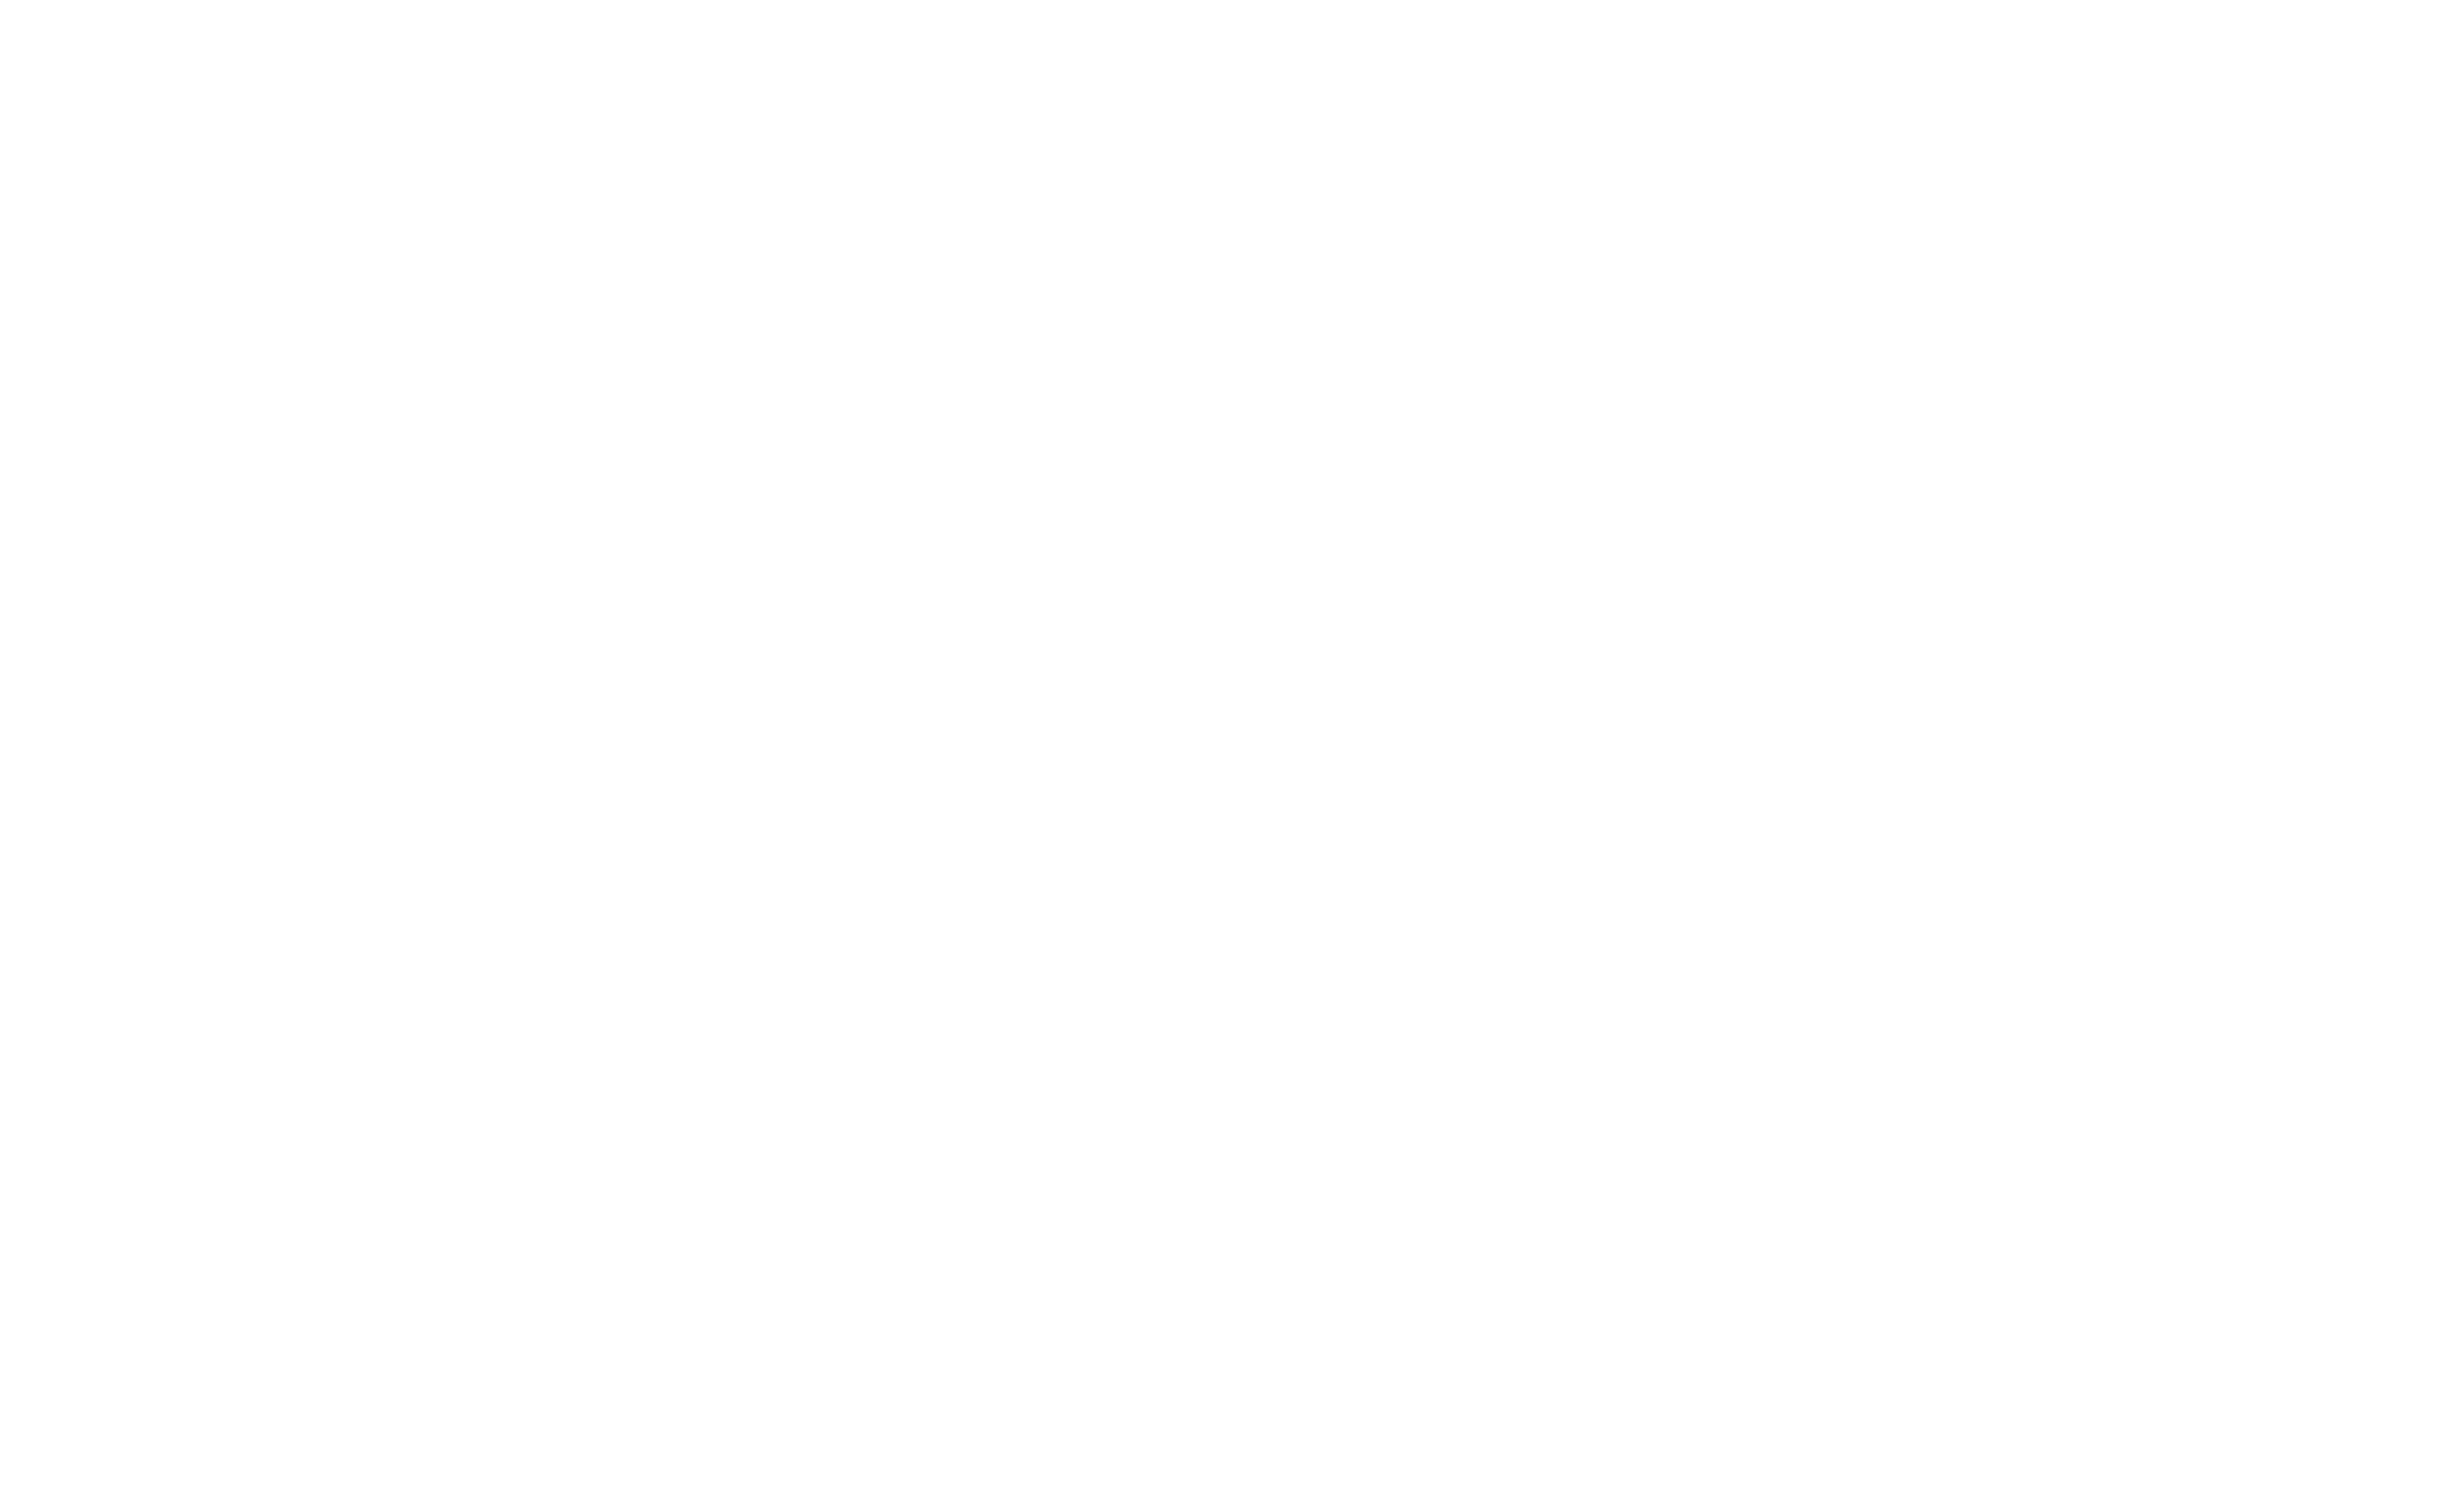 IG GURU - Information Governance News